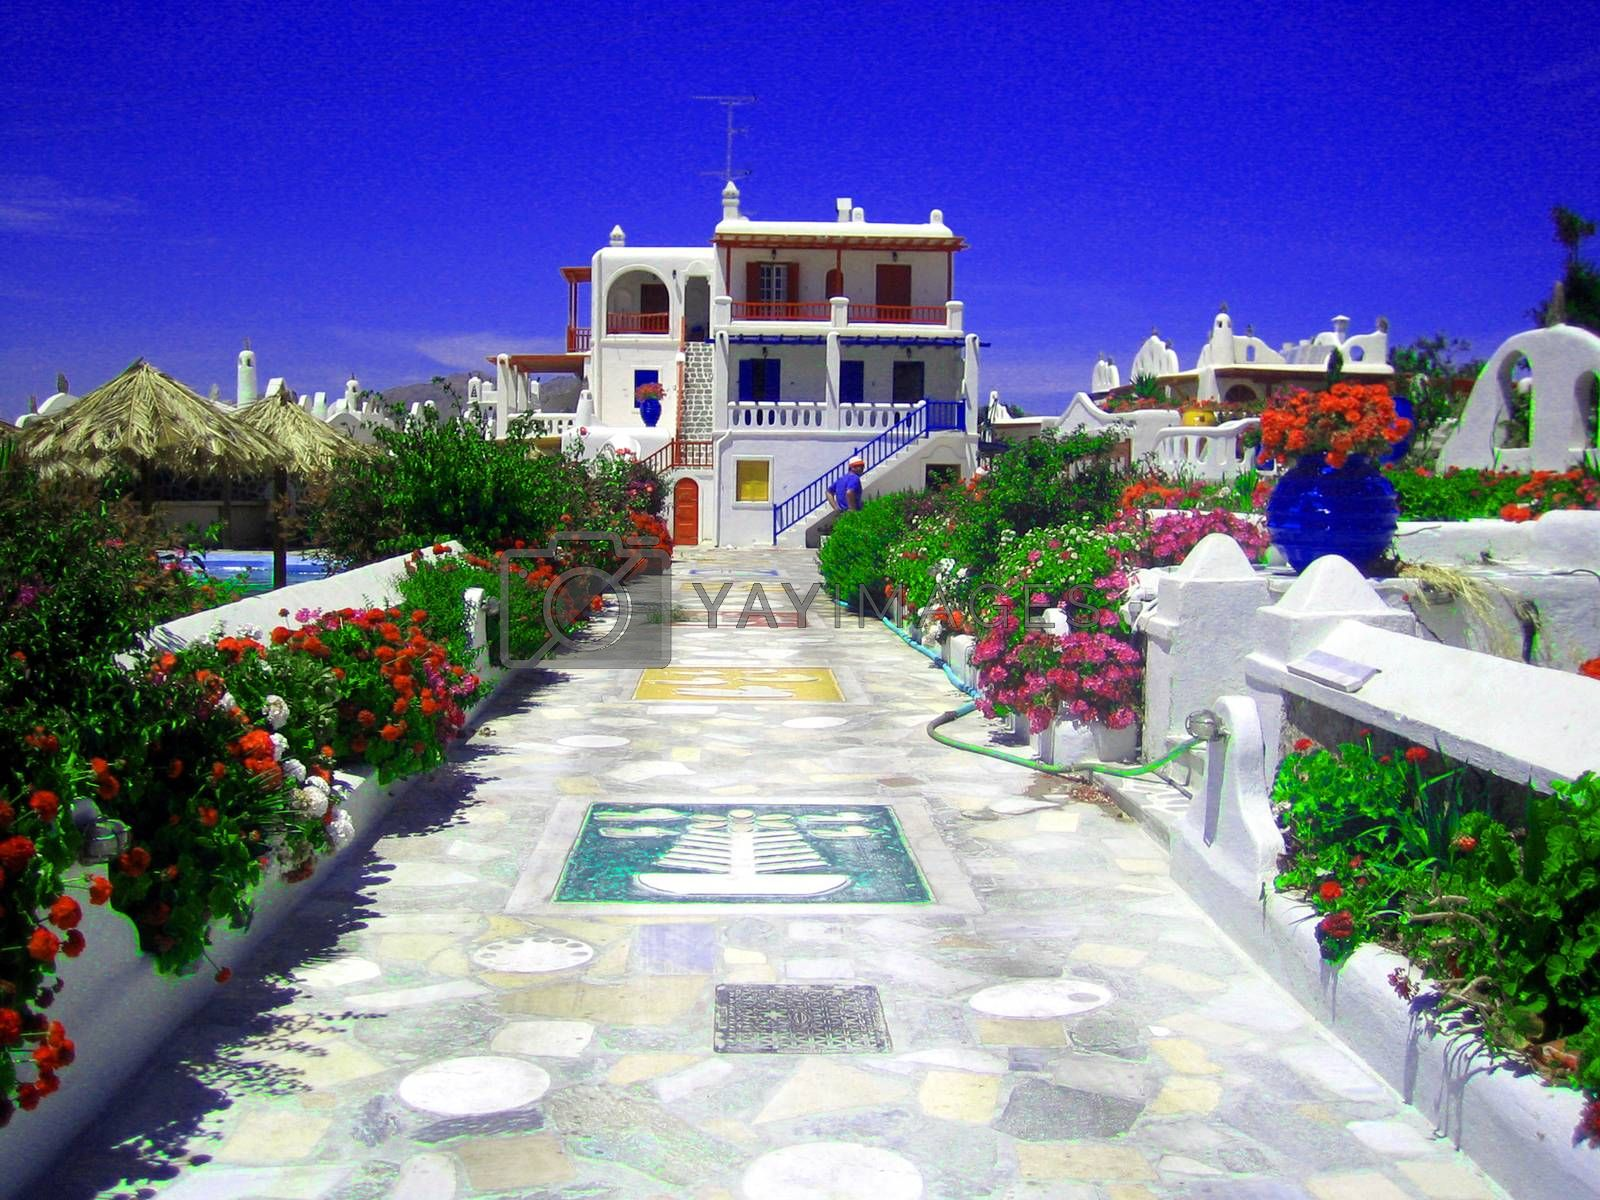 Beautiful Myconos island Grecce background